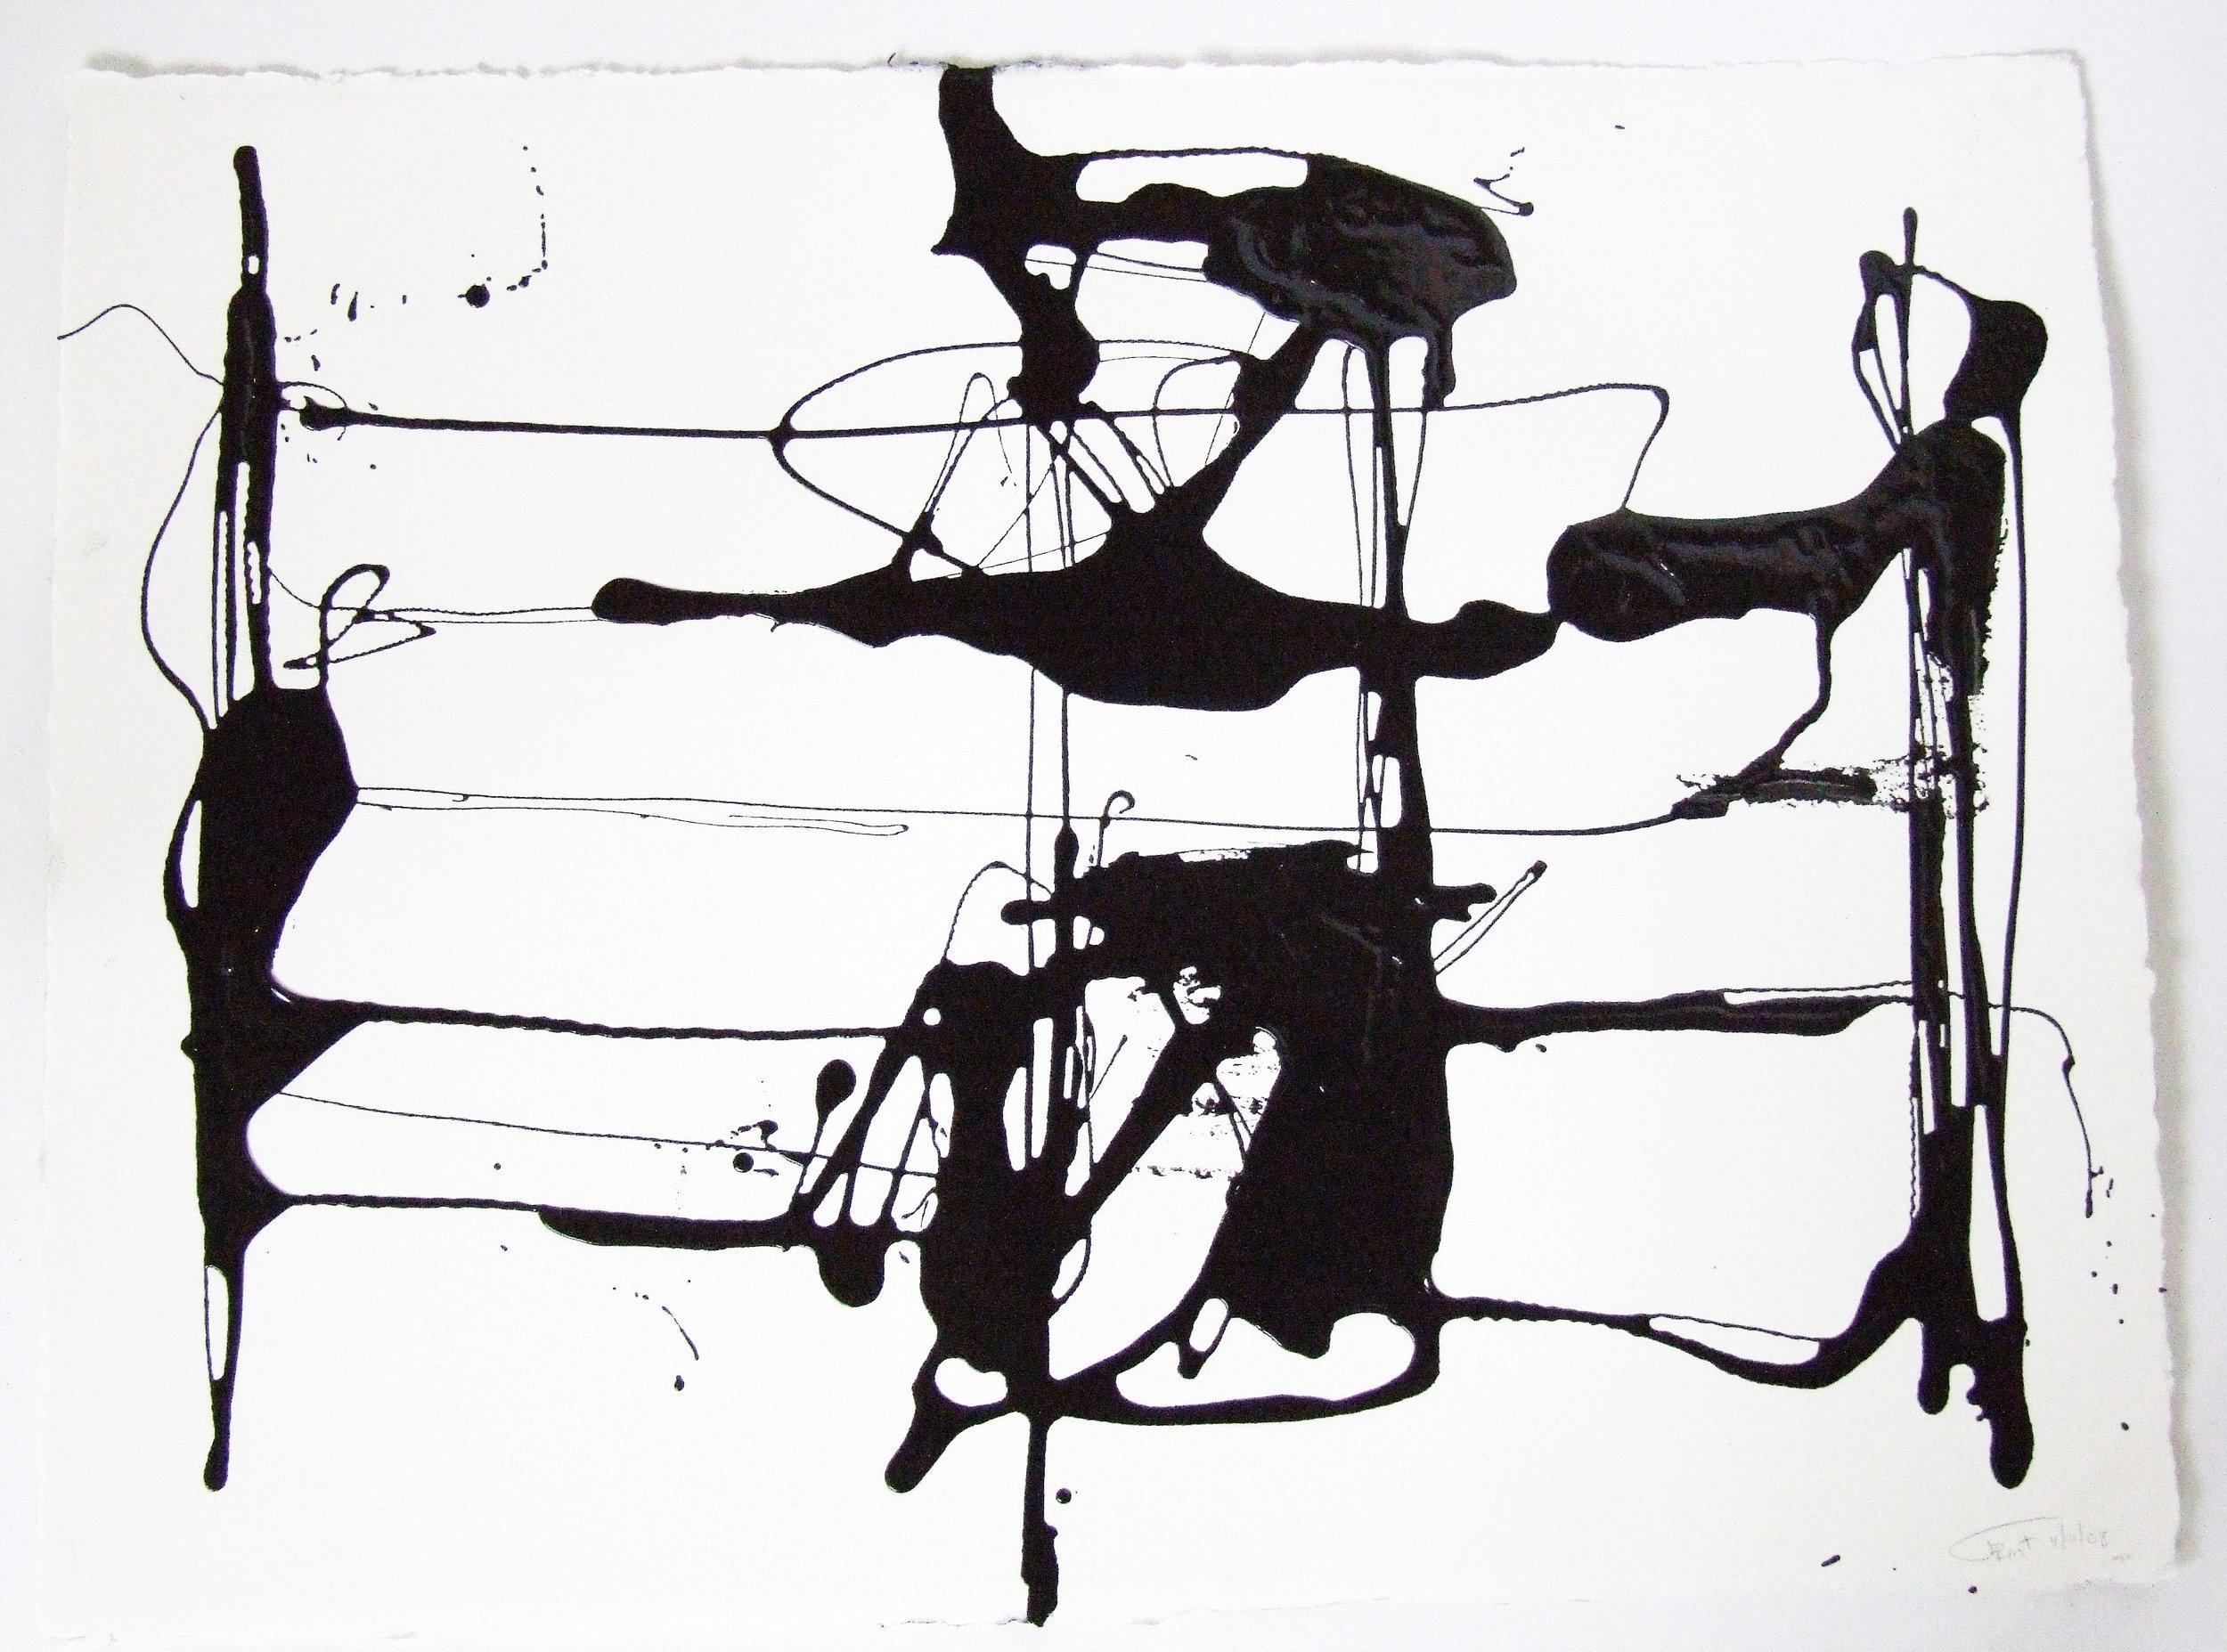 Untitled drawing #1 copy.jpg